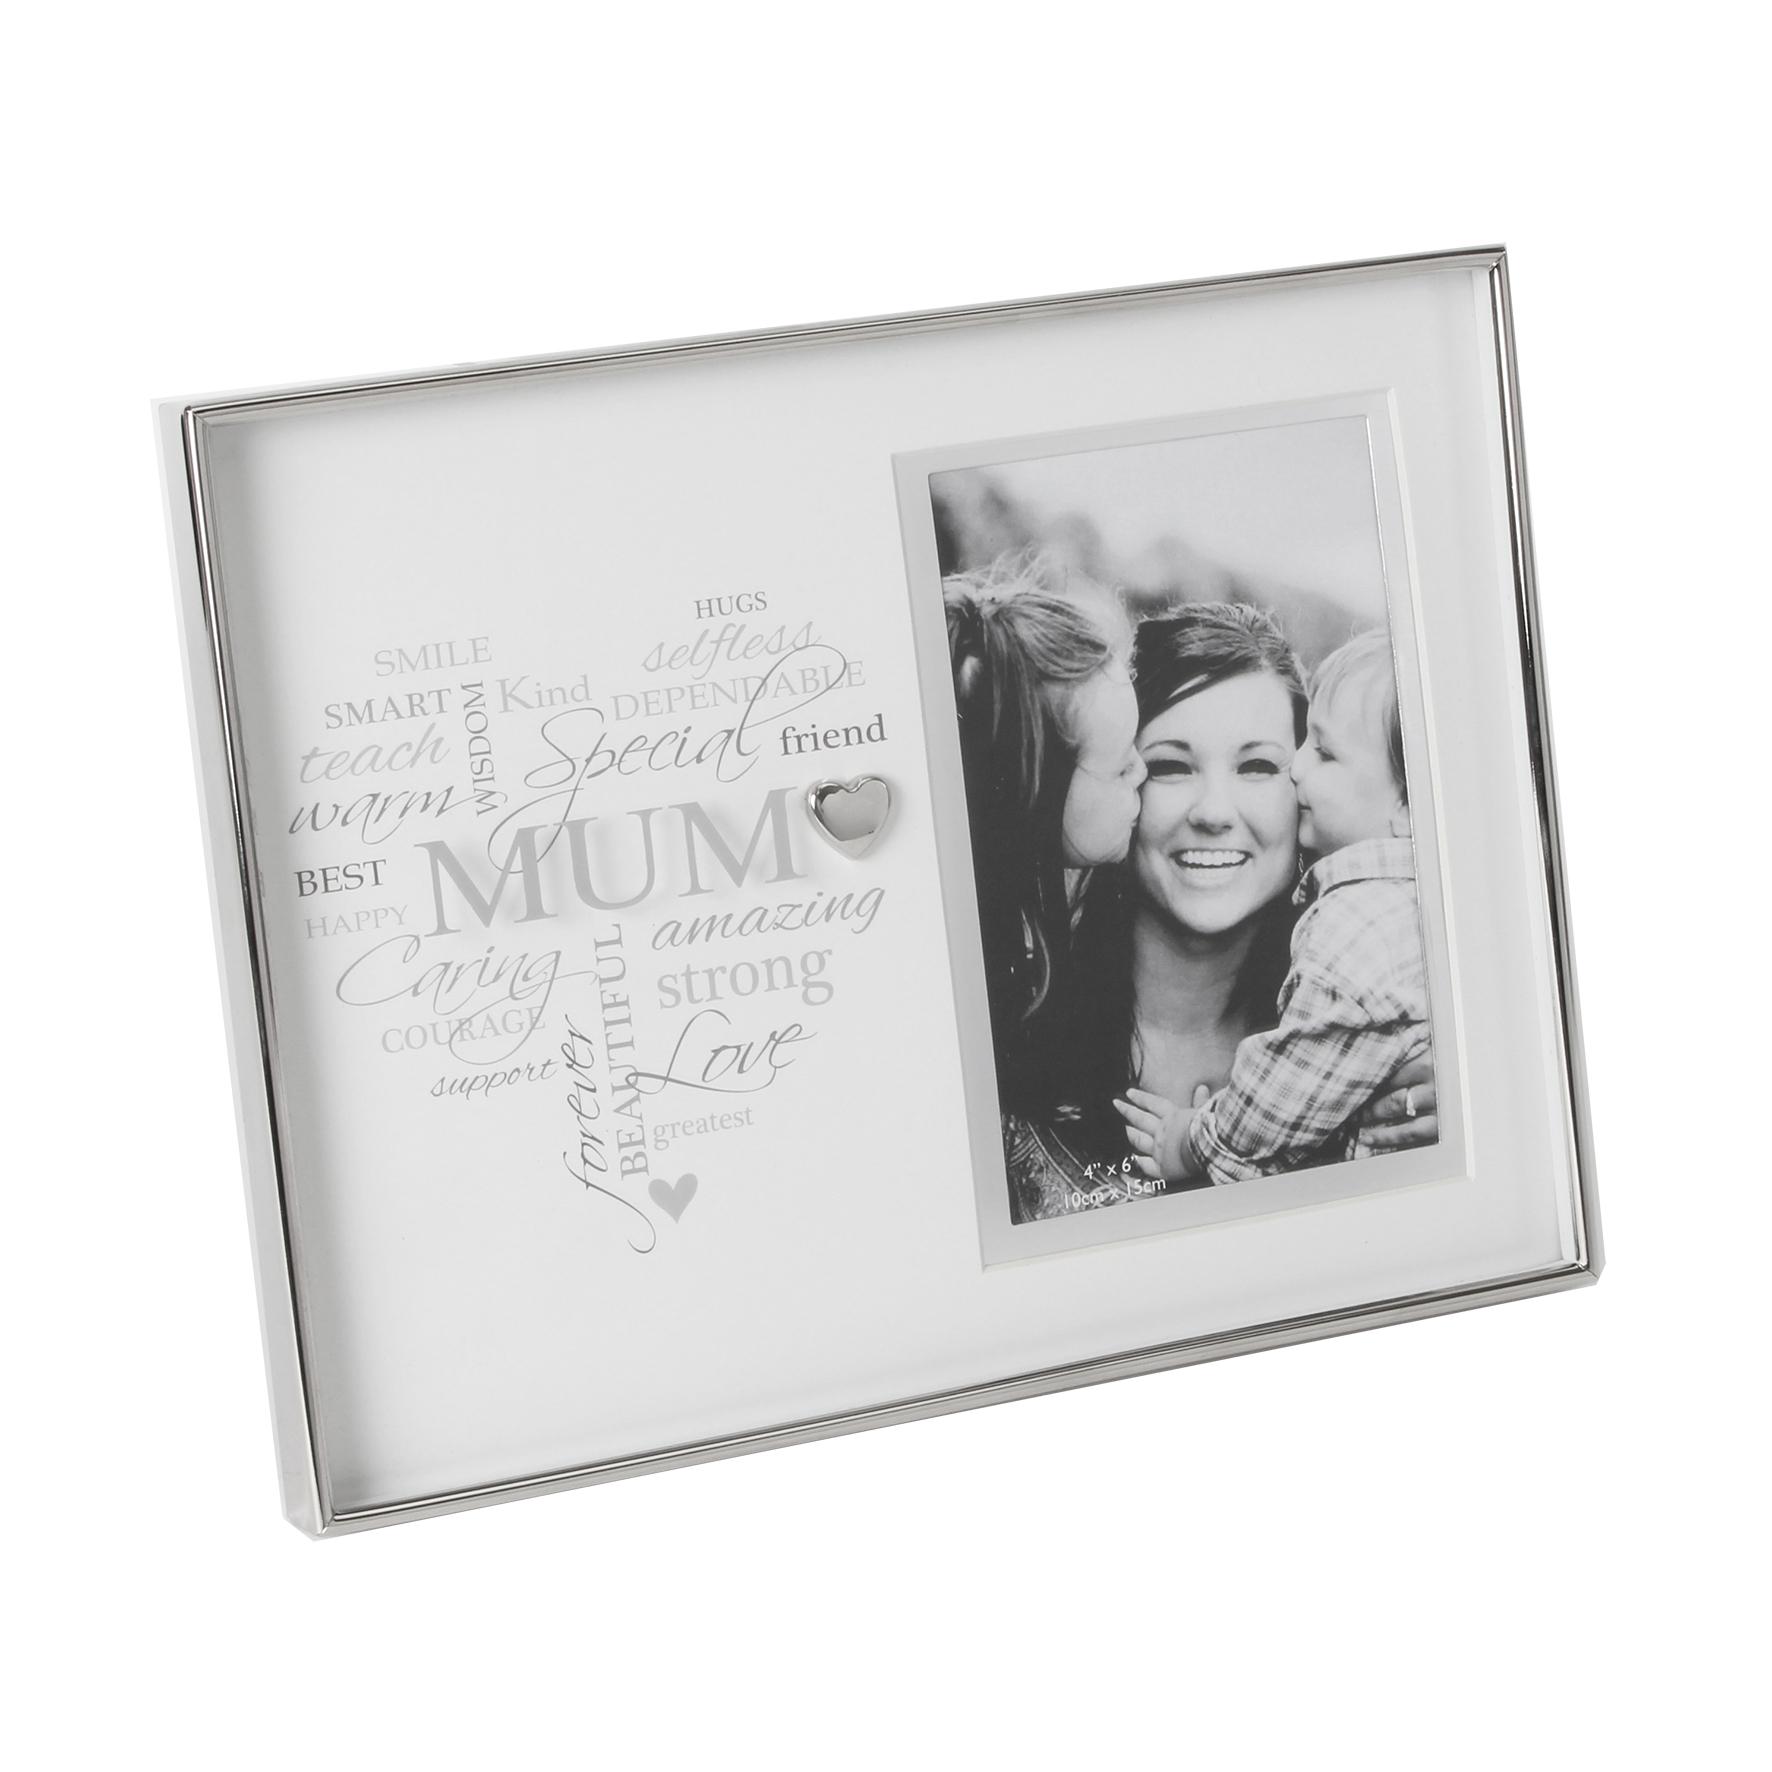 Heartfelt Moments Nickel Plated Frame Heart 4×6 Mum